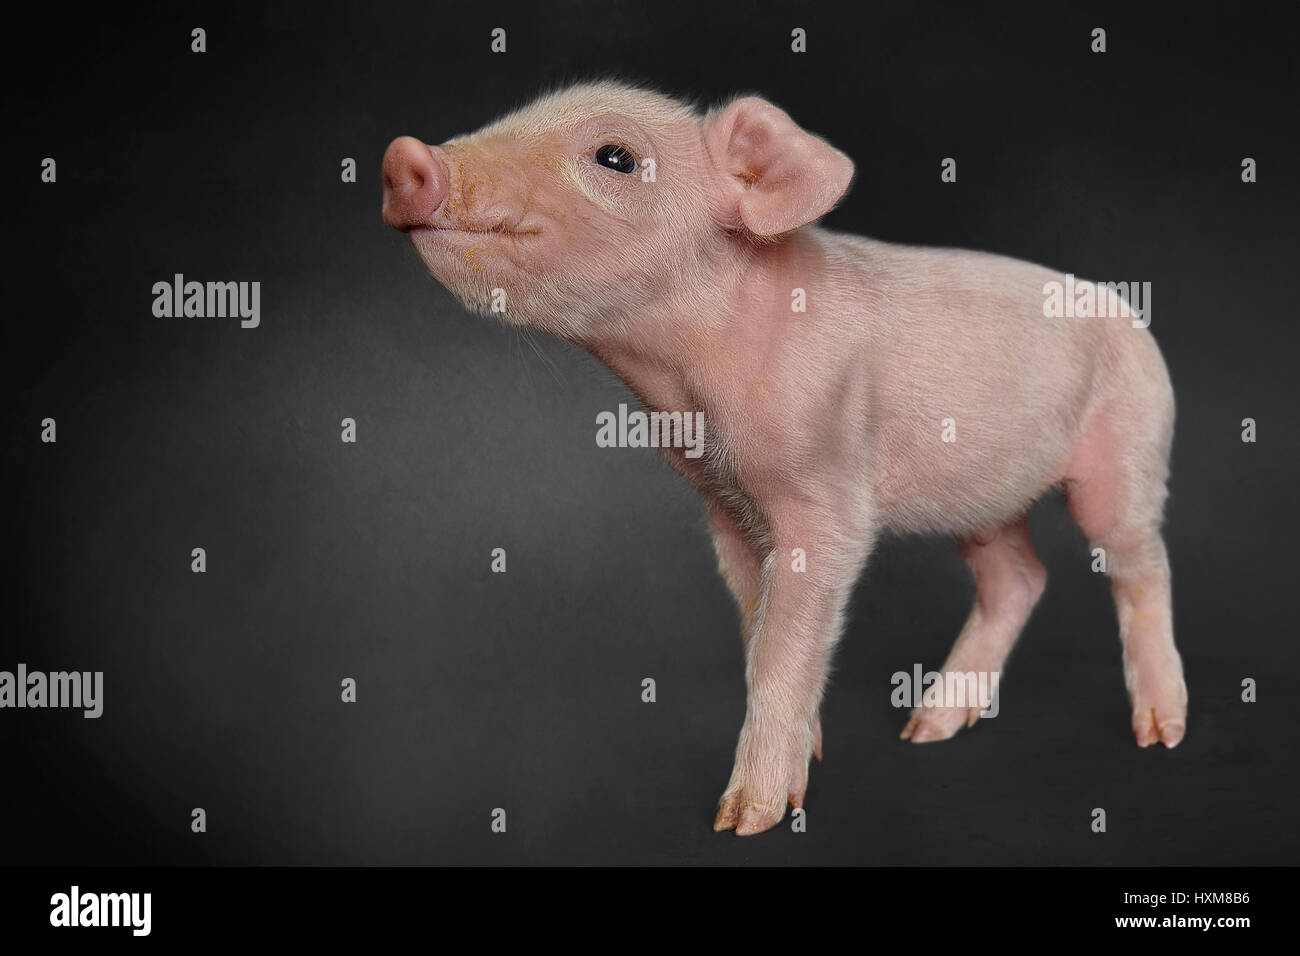 Piglet - Stock Image